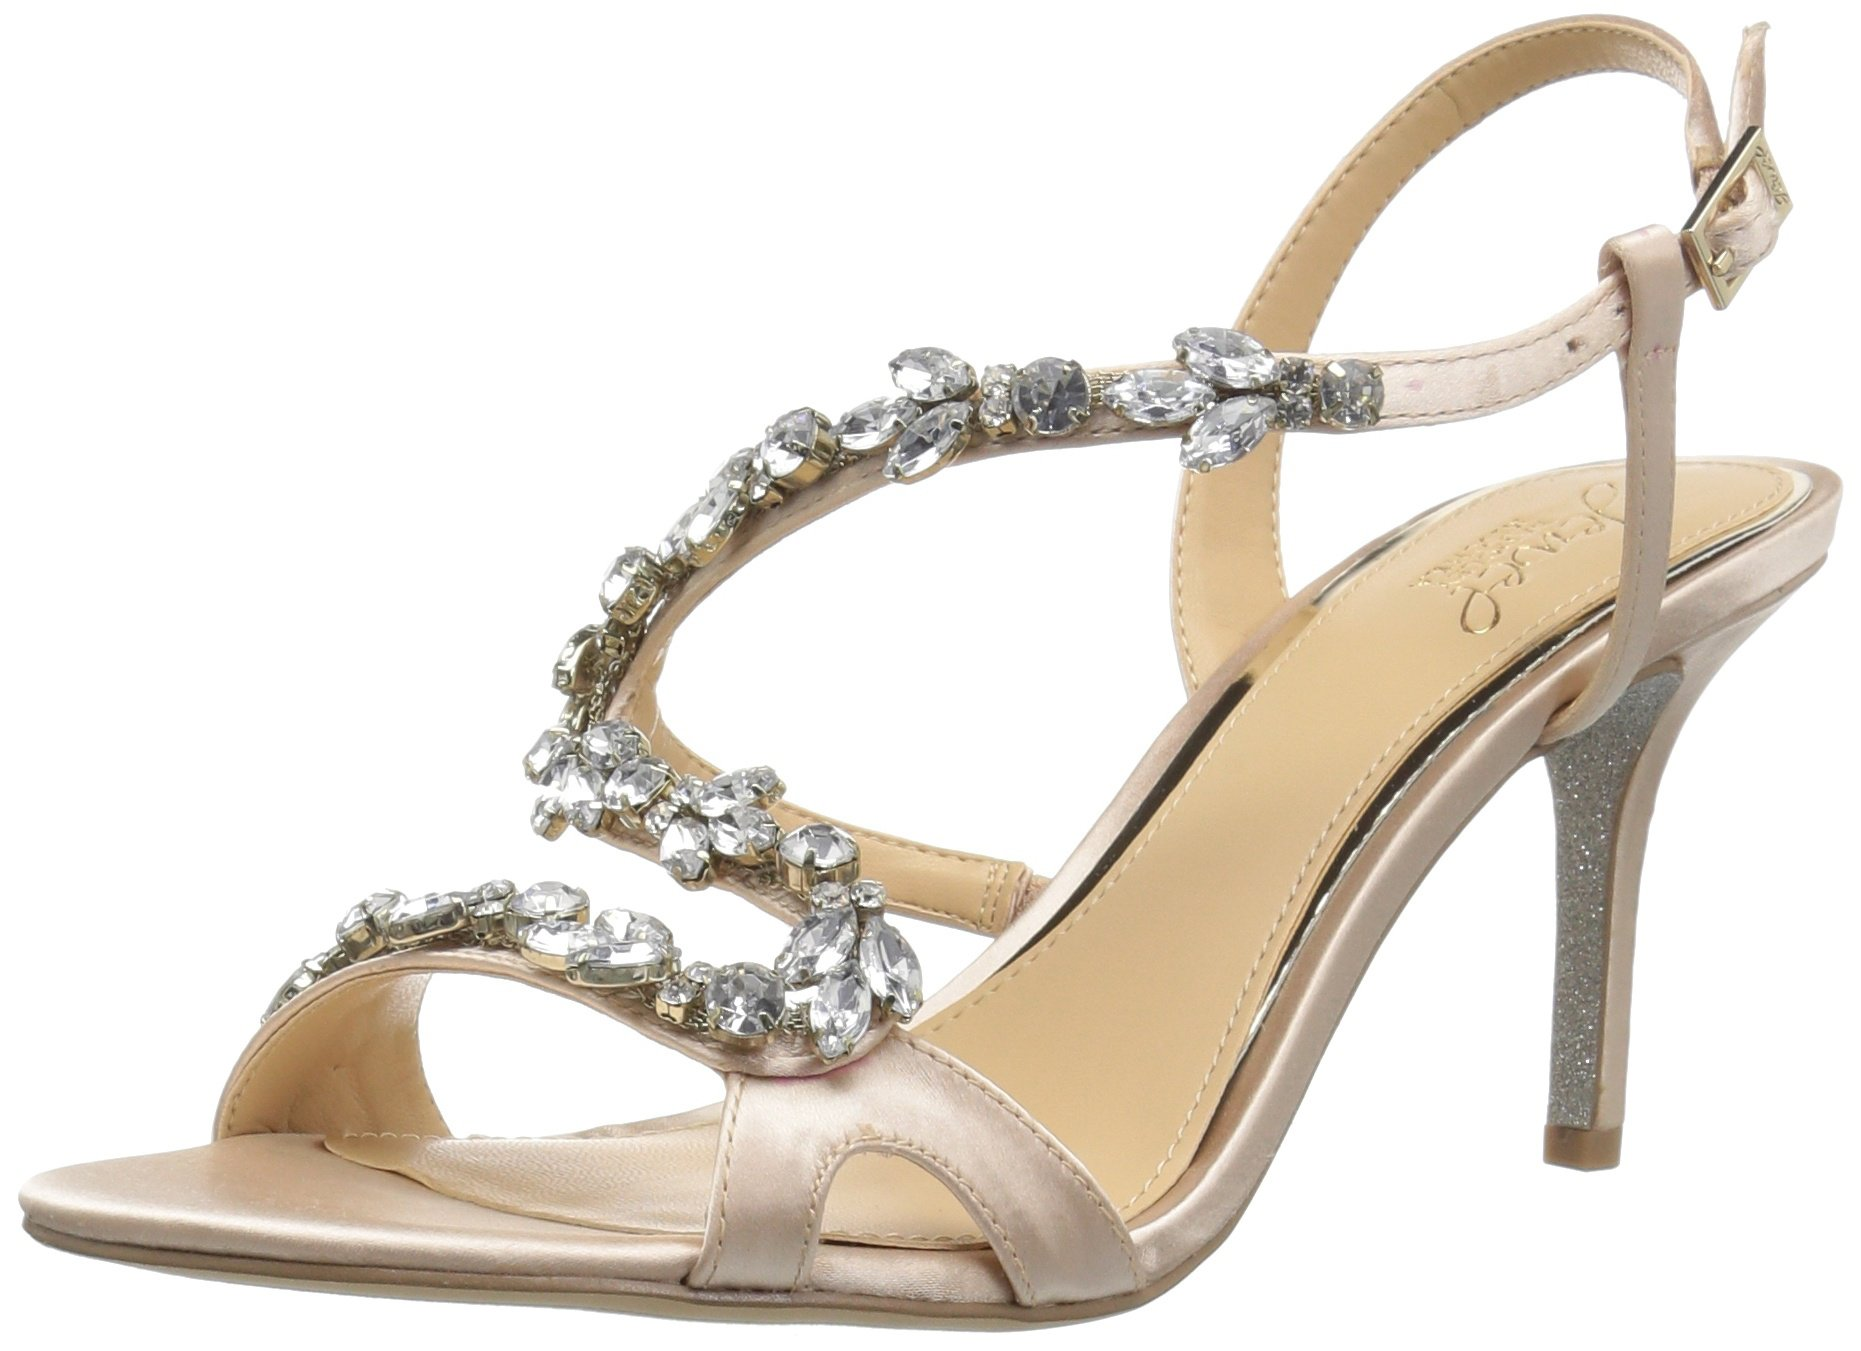 Badgley Mischka Jewel Women's Ganet Heeled Sandal, Champagne, 11 Medium US